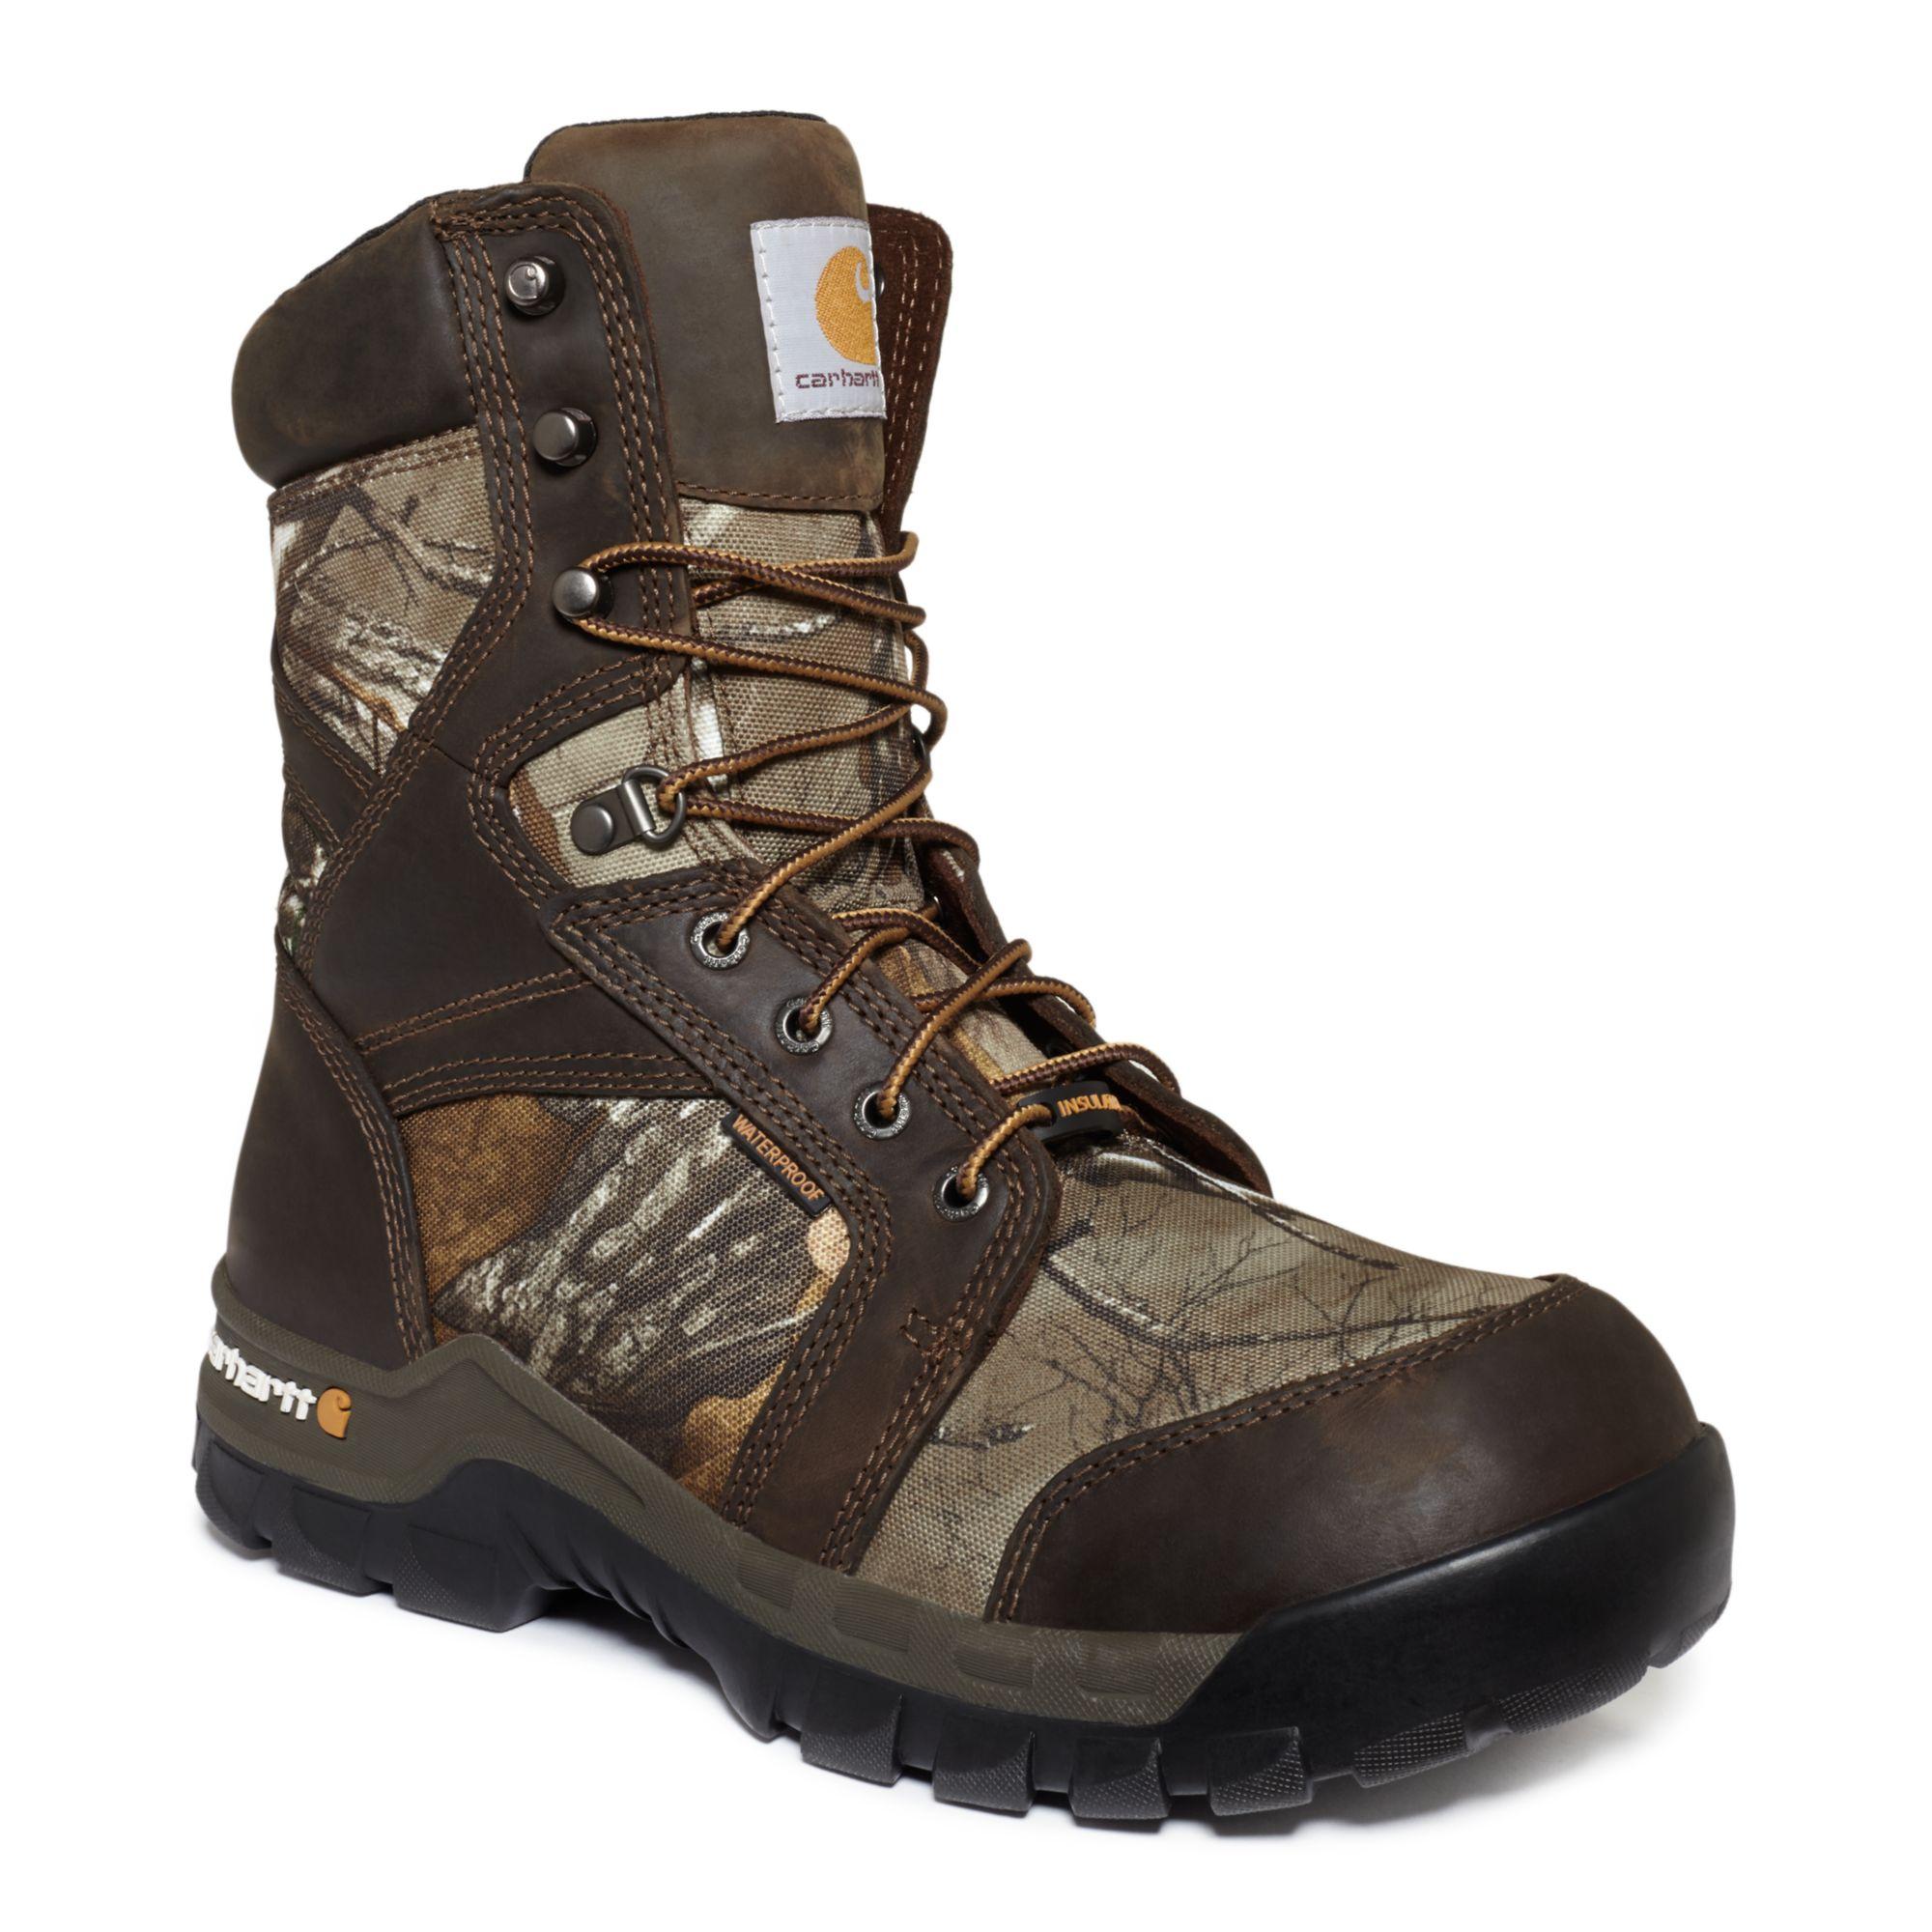 carhartt 8 inch work flex waterproof insulated boots in